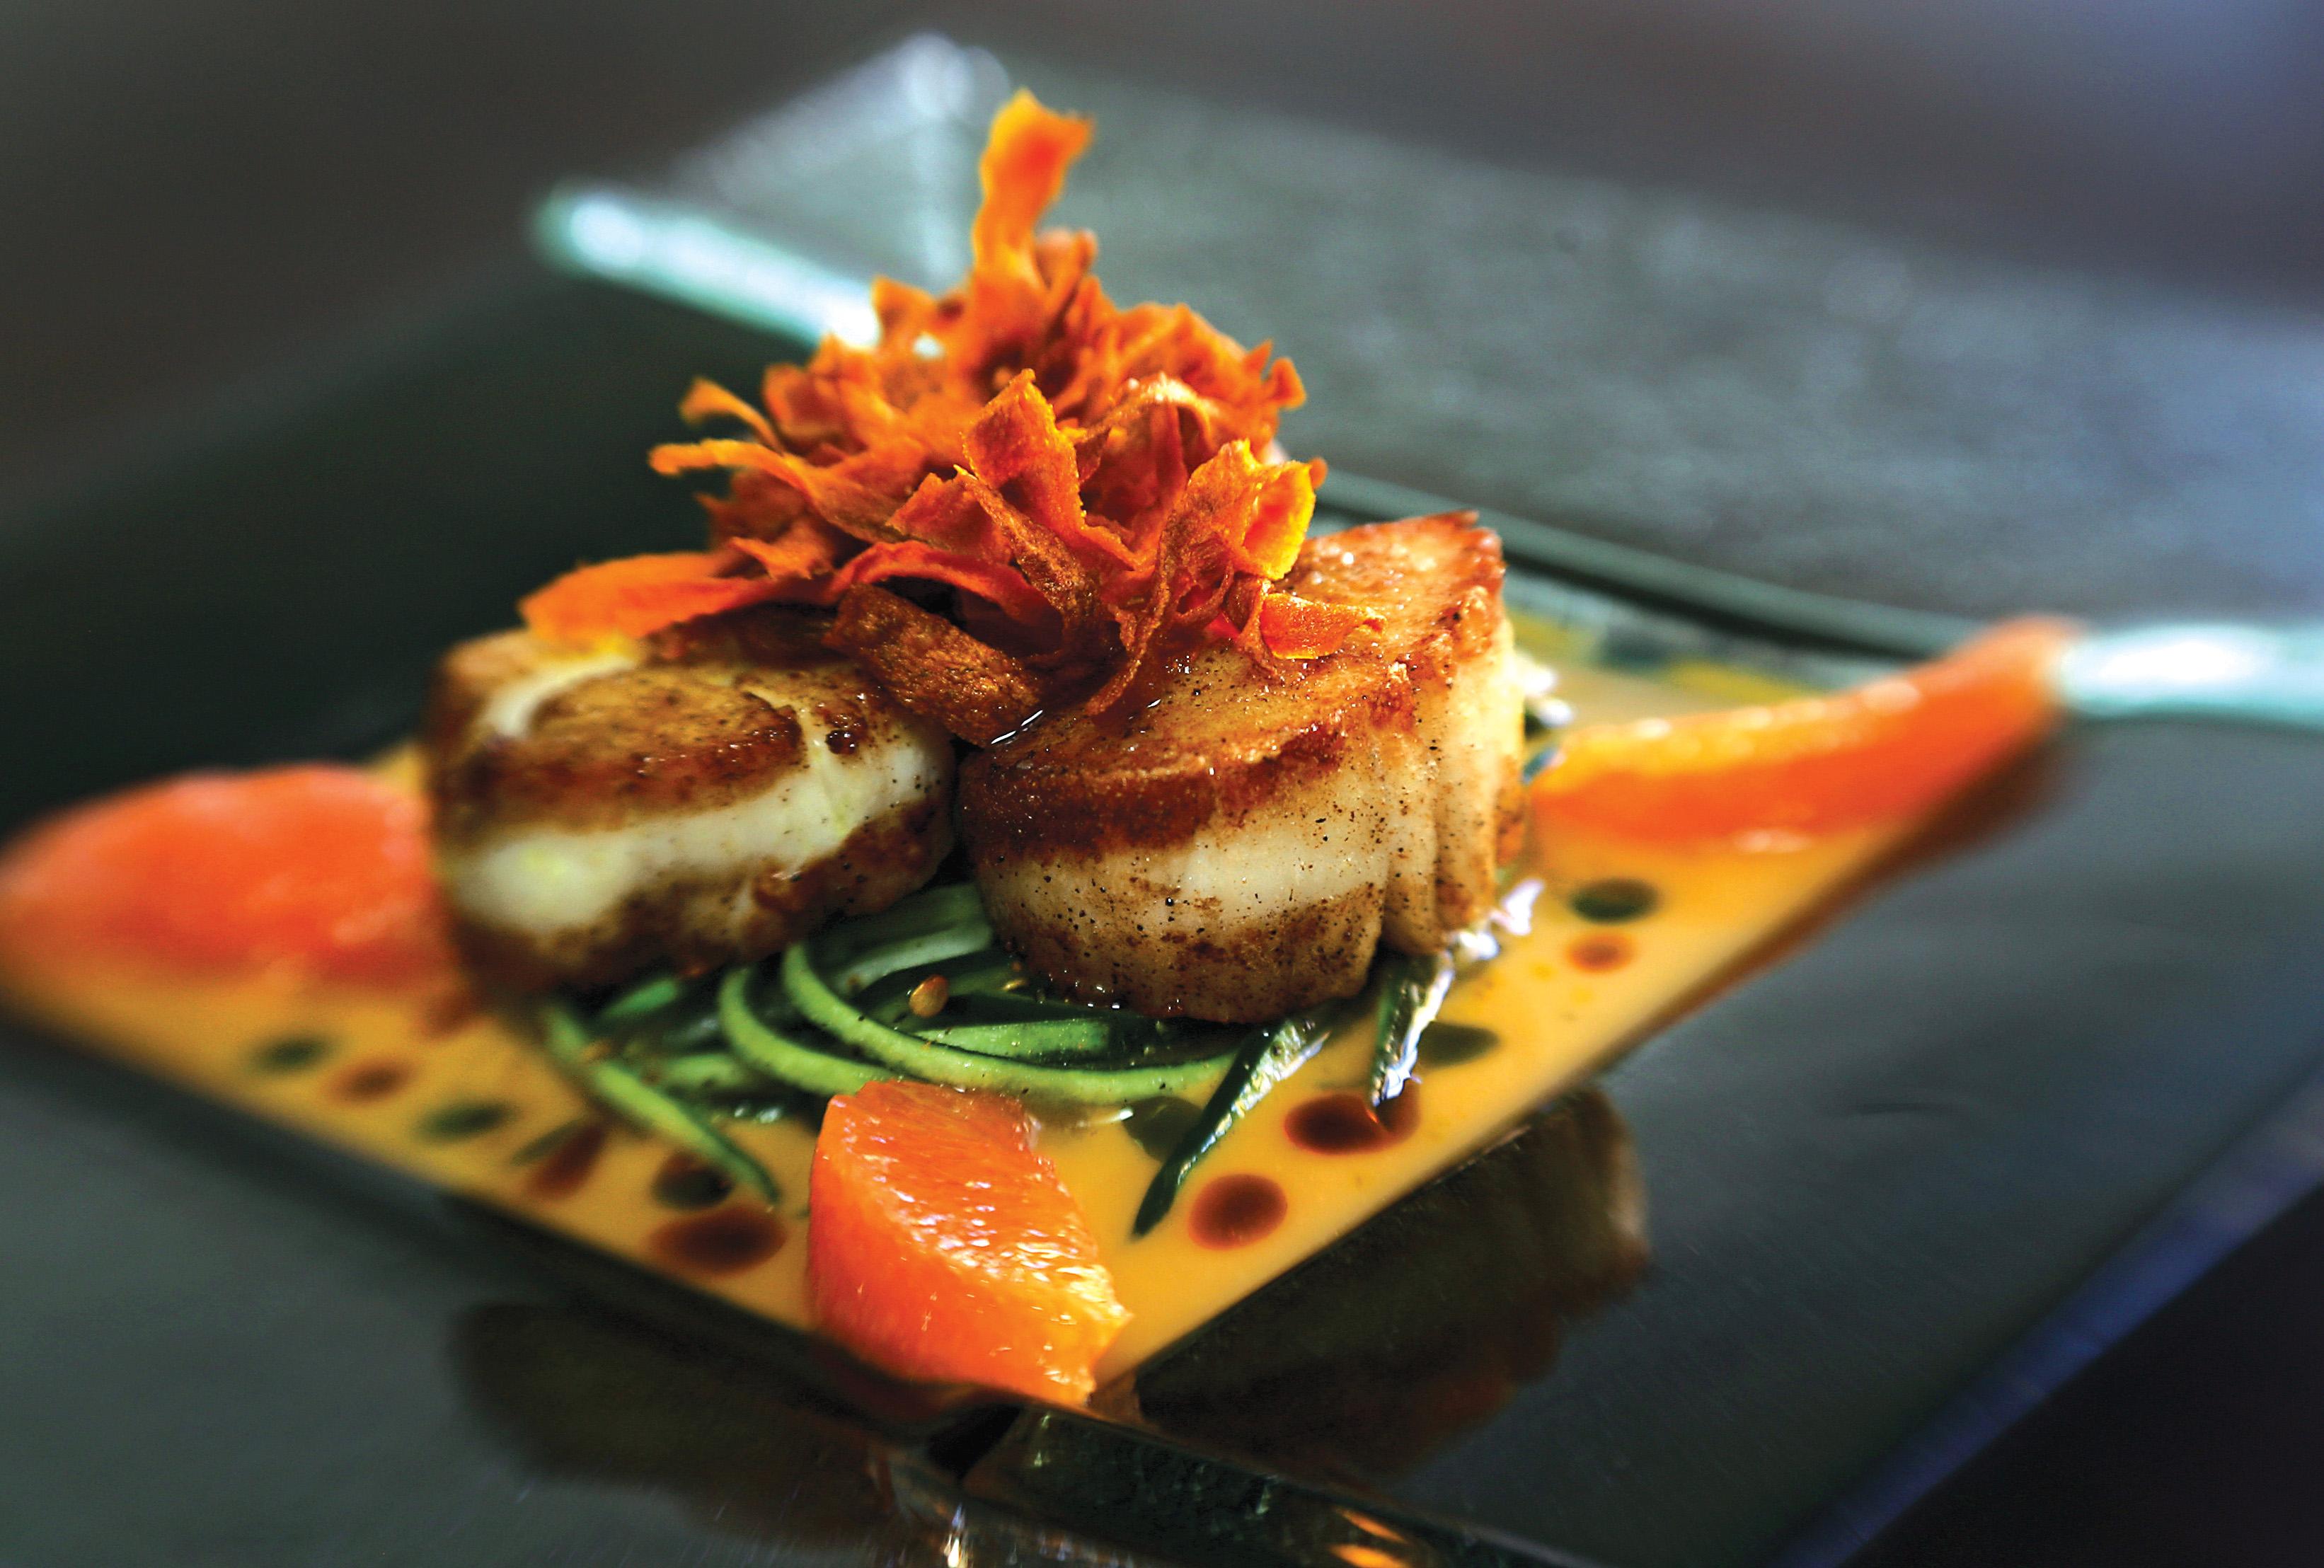 Fine Dining Dish Credit Steve Crecelius VISIT DENVER 04f0cc9d 3780 44ab be5c 36f3c6f0d3ab